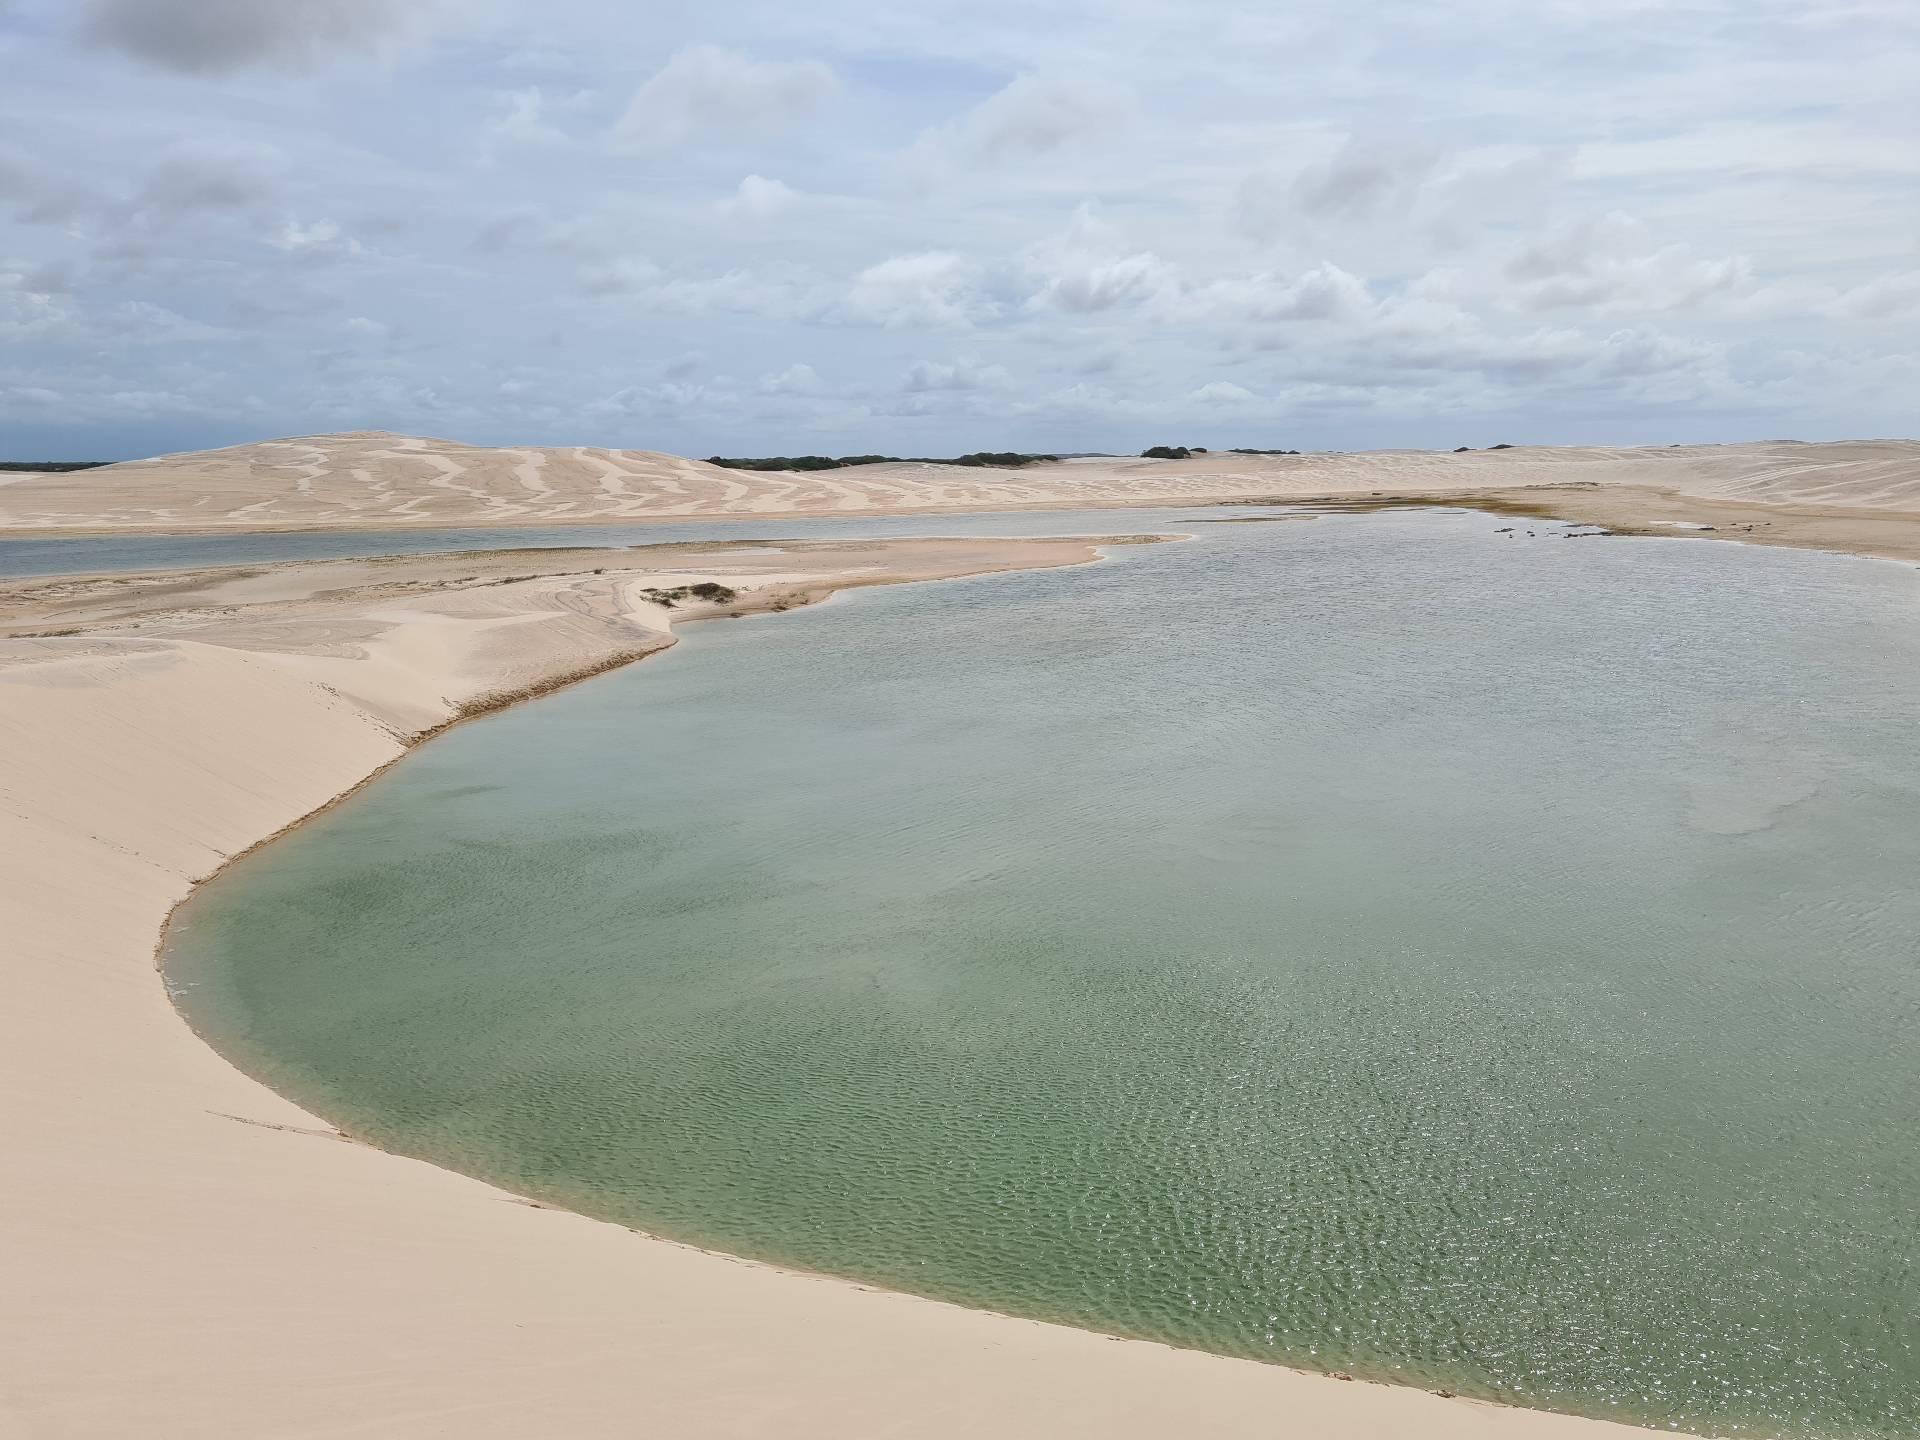 Лагуна среди дюн, Ленсойс-Марраньенсис